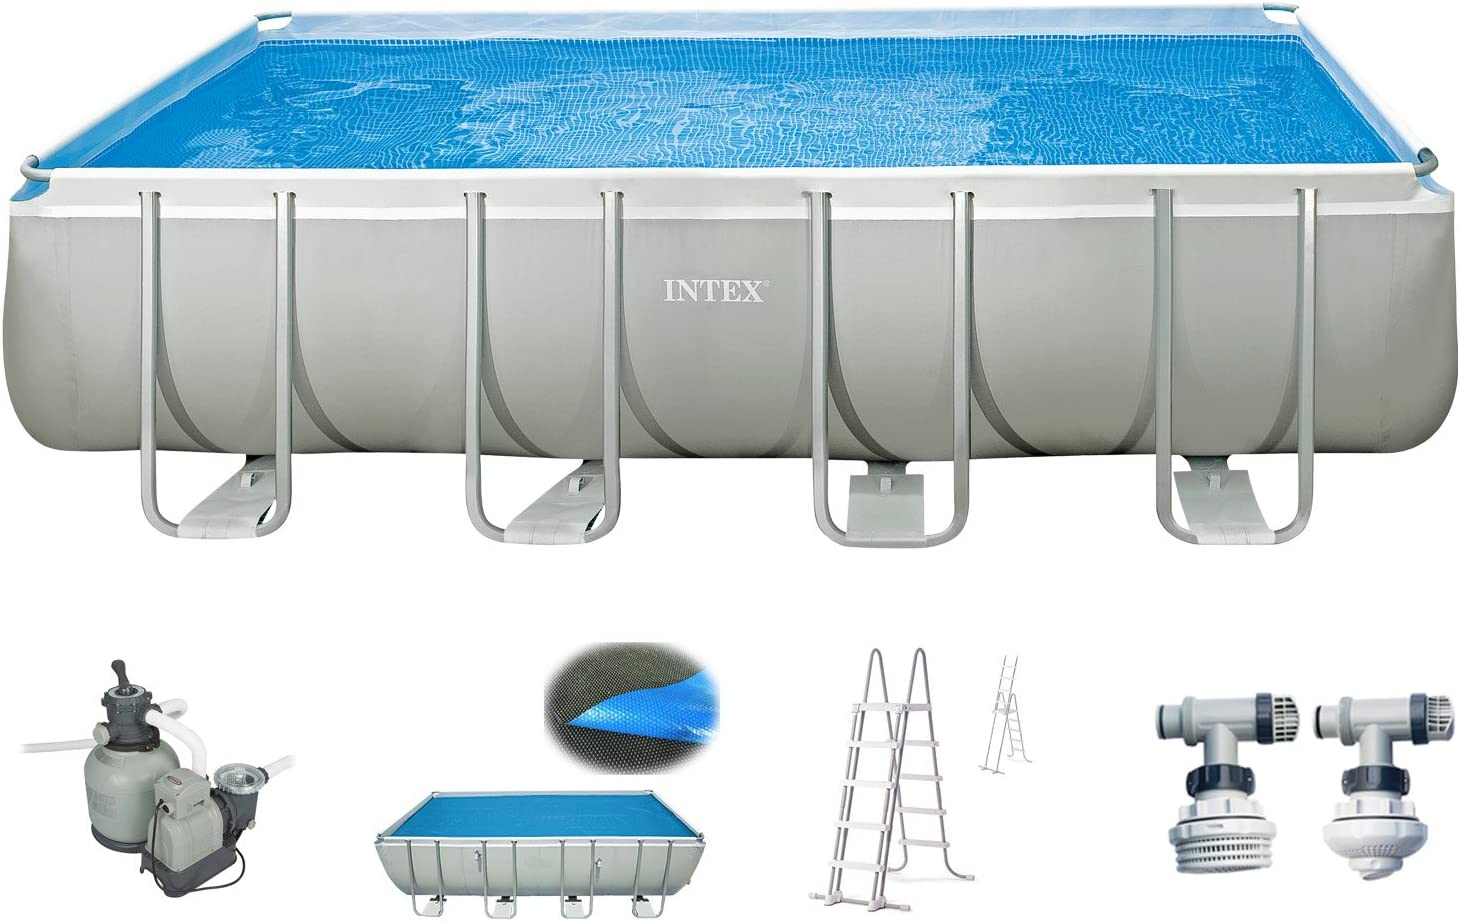 Intex Piscina 549 x 274 x 132 cm Piscina acero pared metal marco con Intex filtro de arena 10.500 L/h, escalera, Solar pantalla: Amazon.es: Jardín